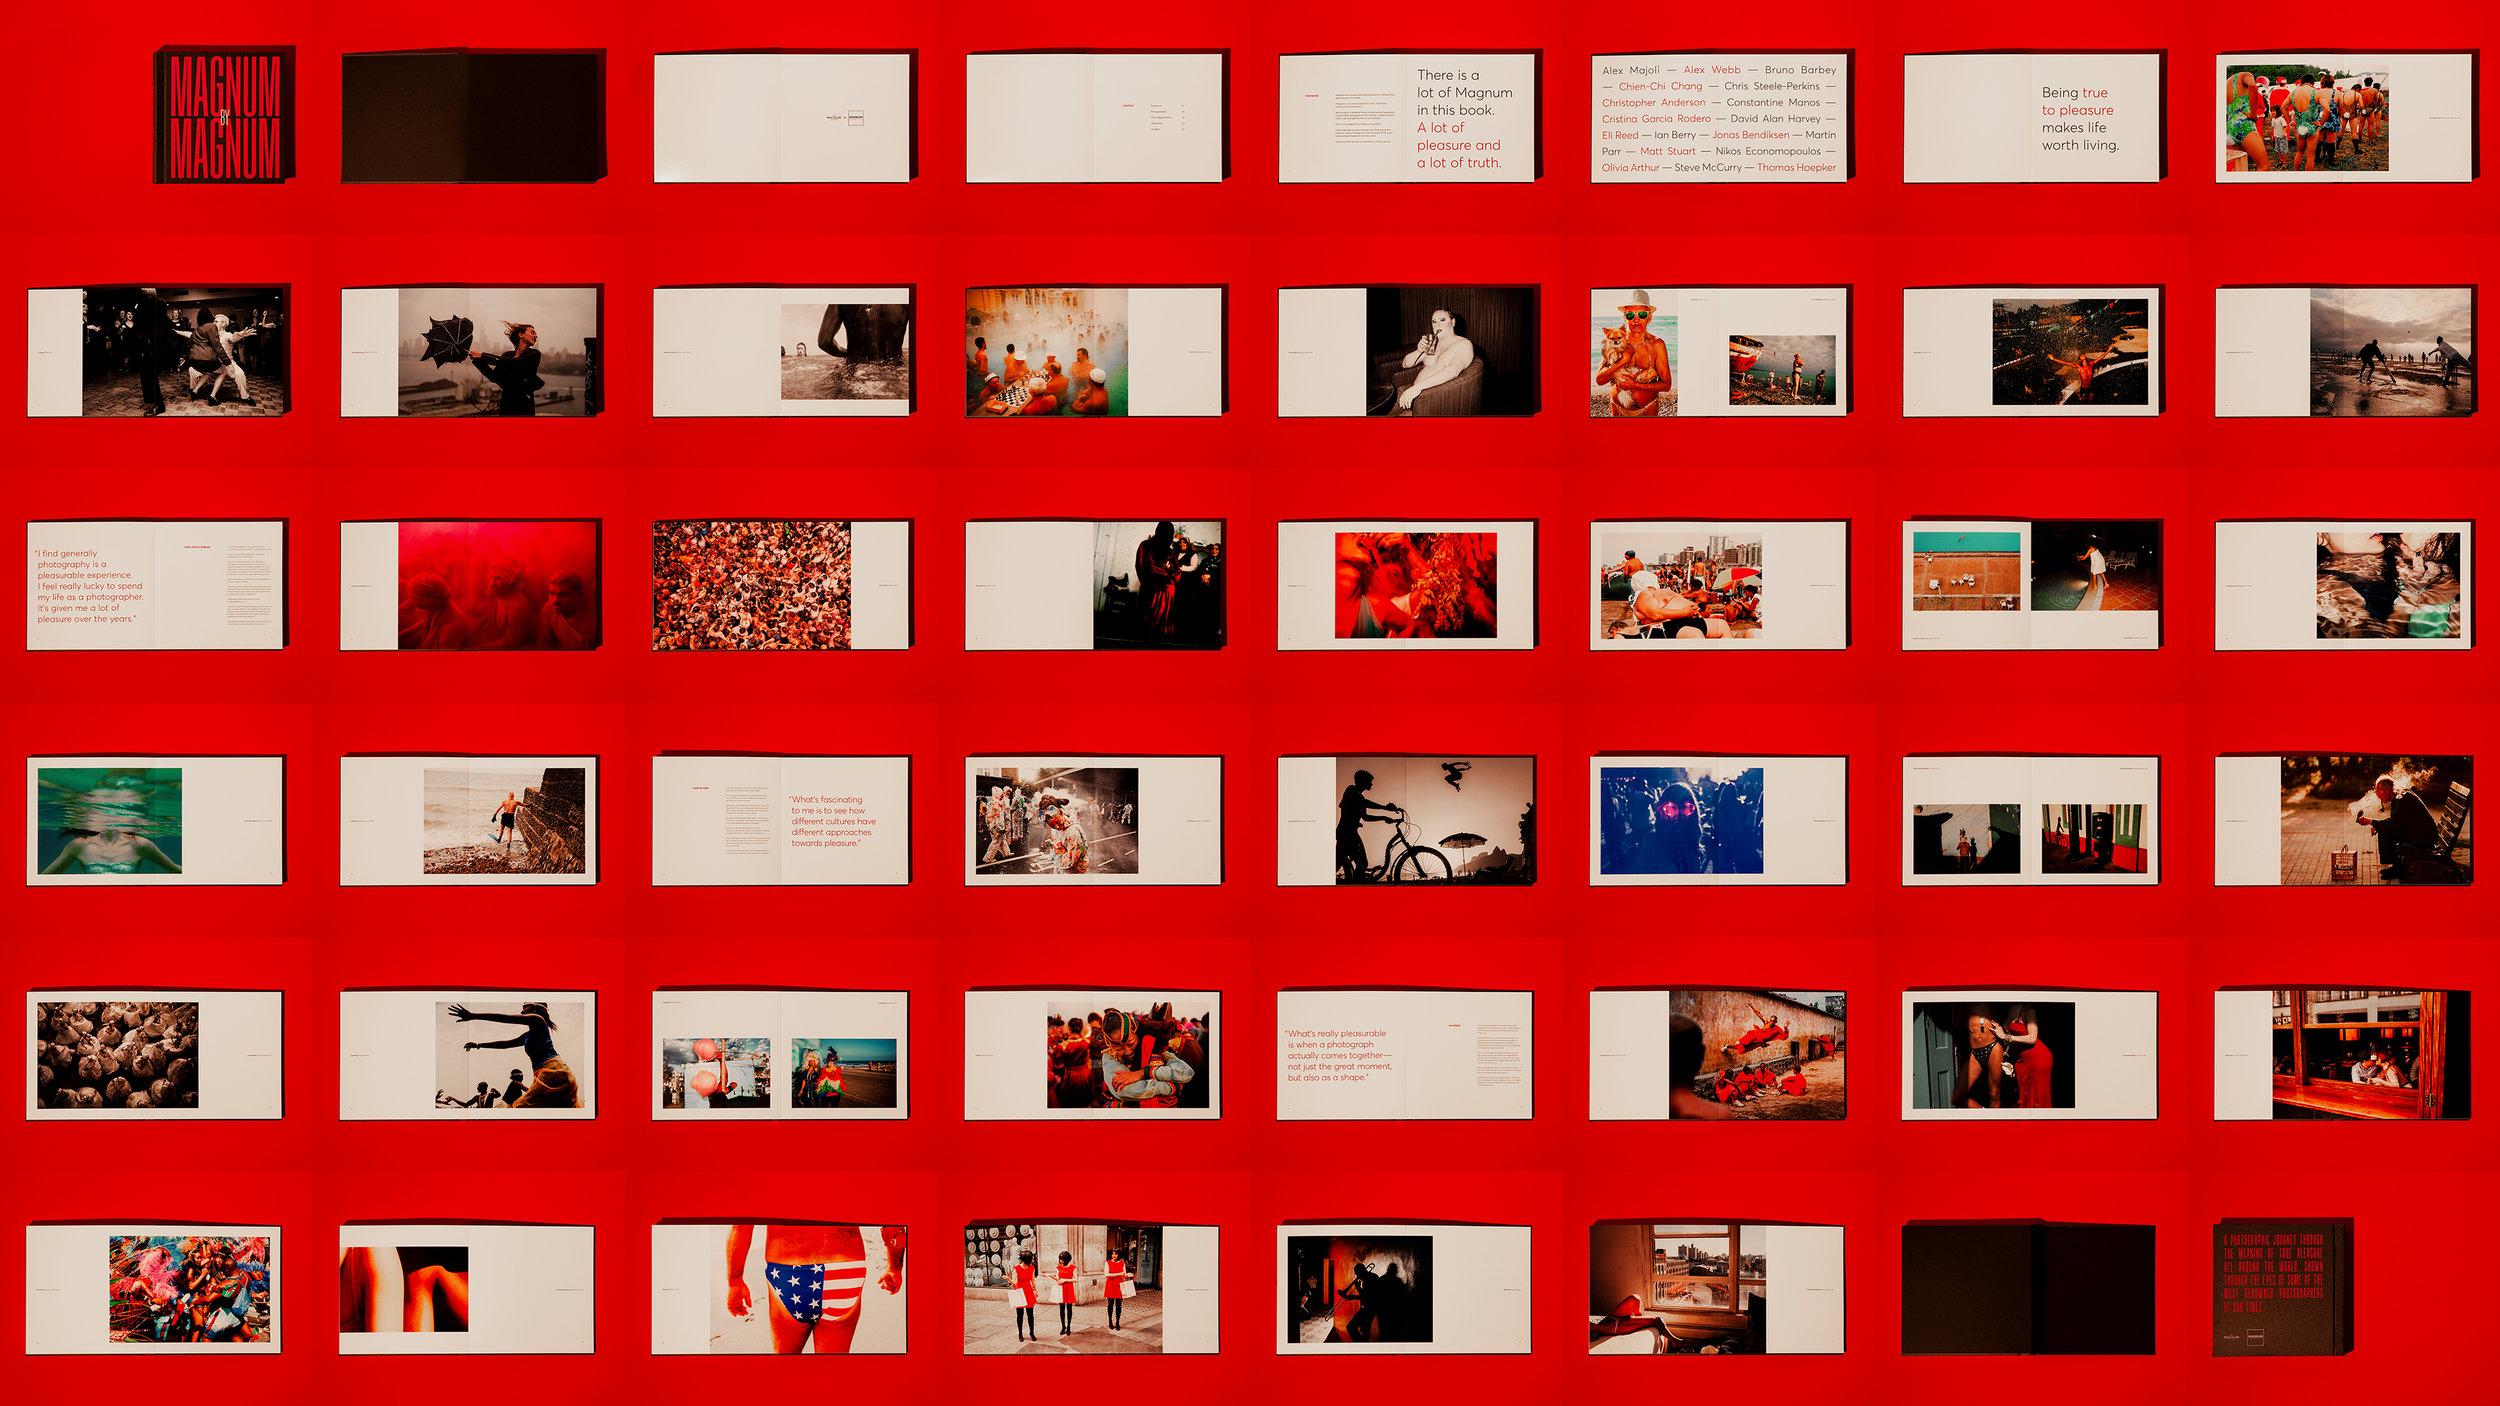 magnum-by-magnum-book8.jpg